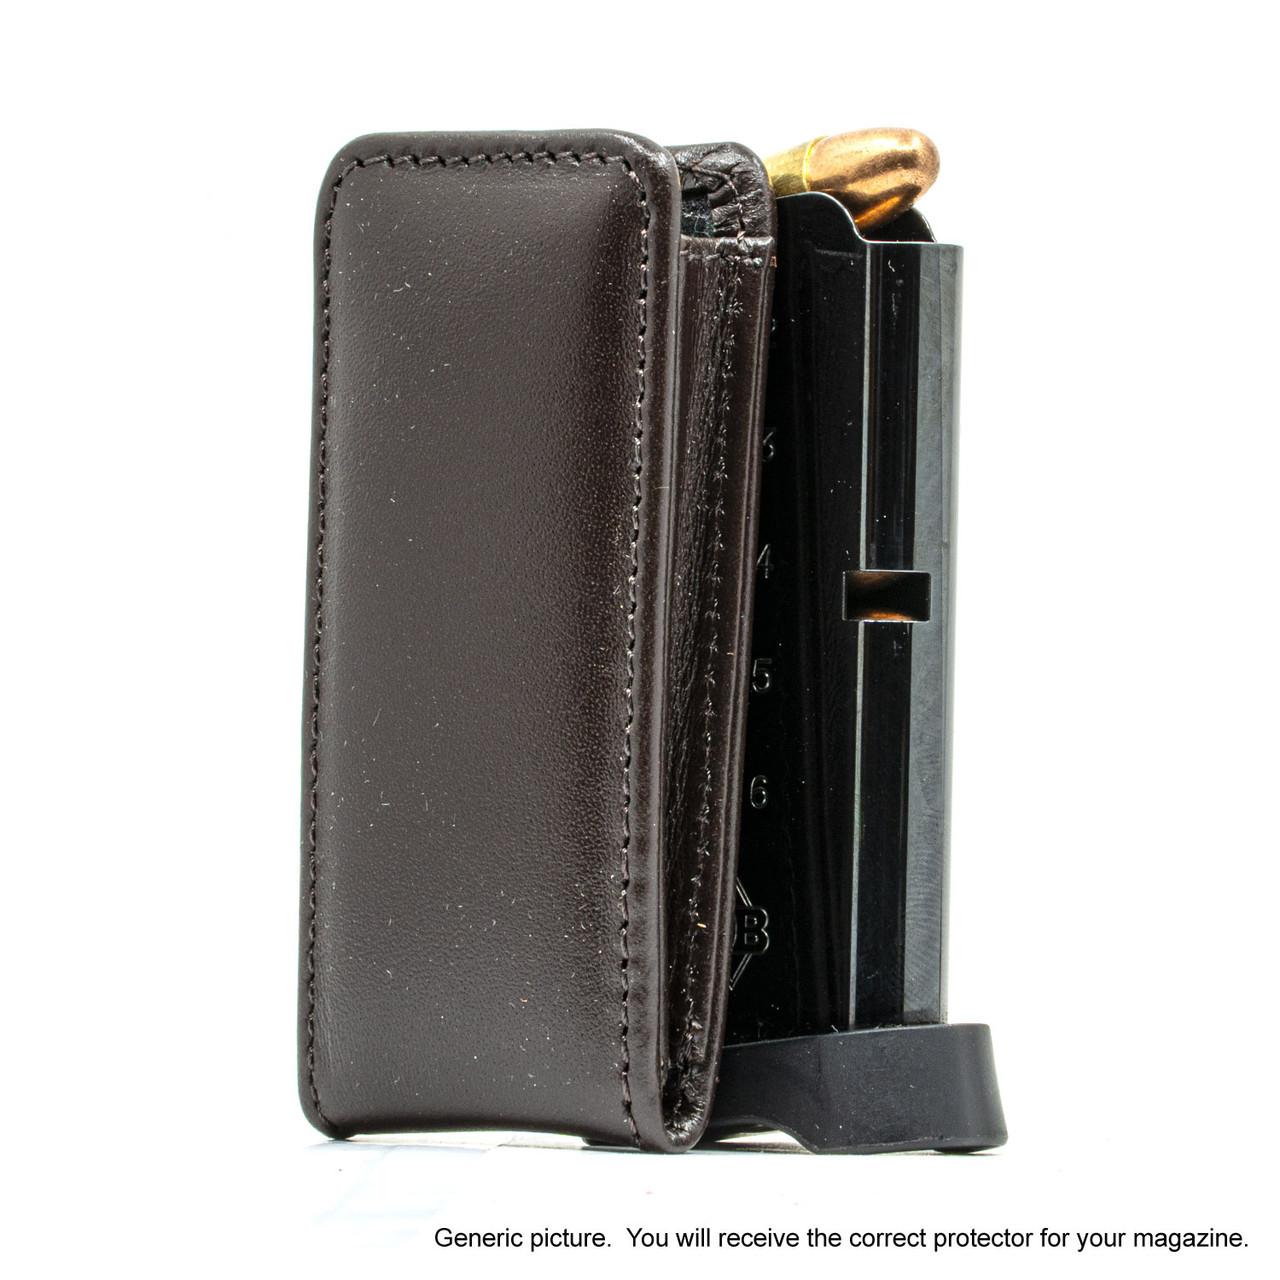 Mossberg MC2c Brown Leather Magazine Pocket Protector